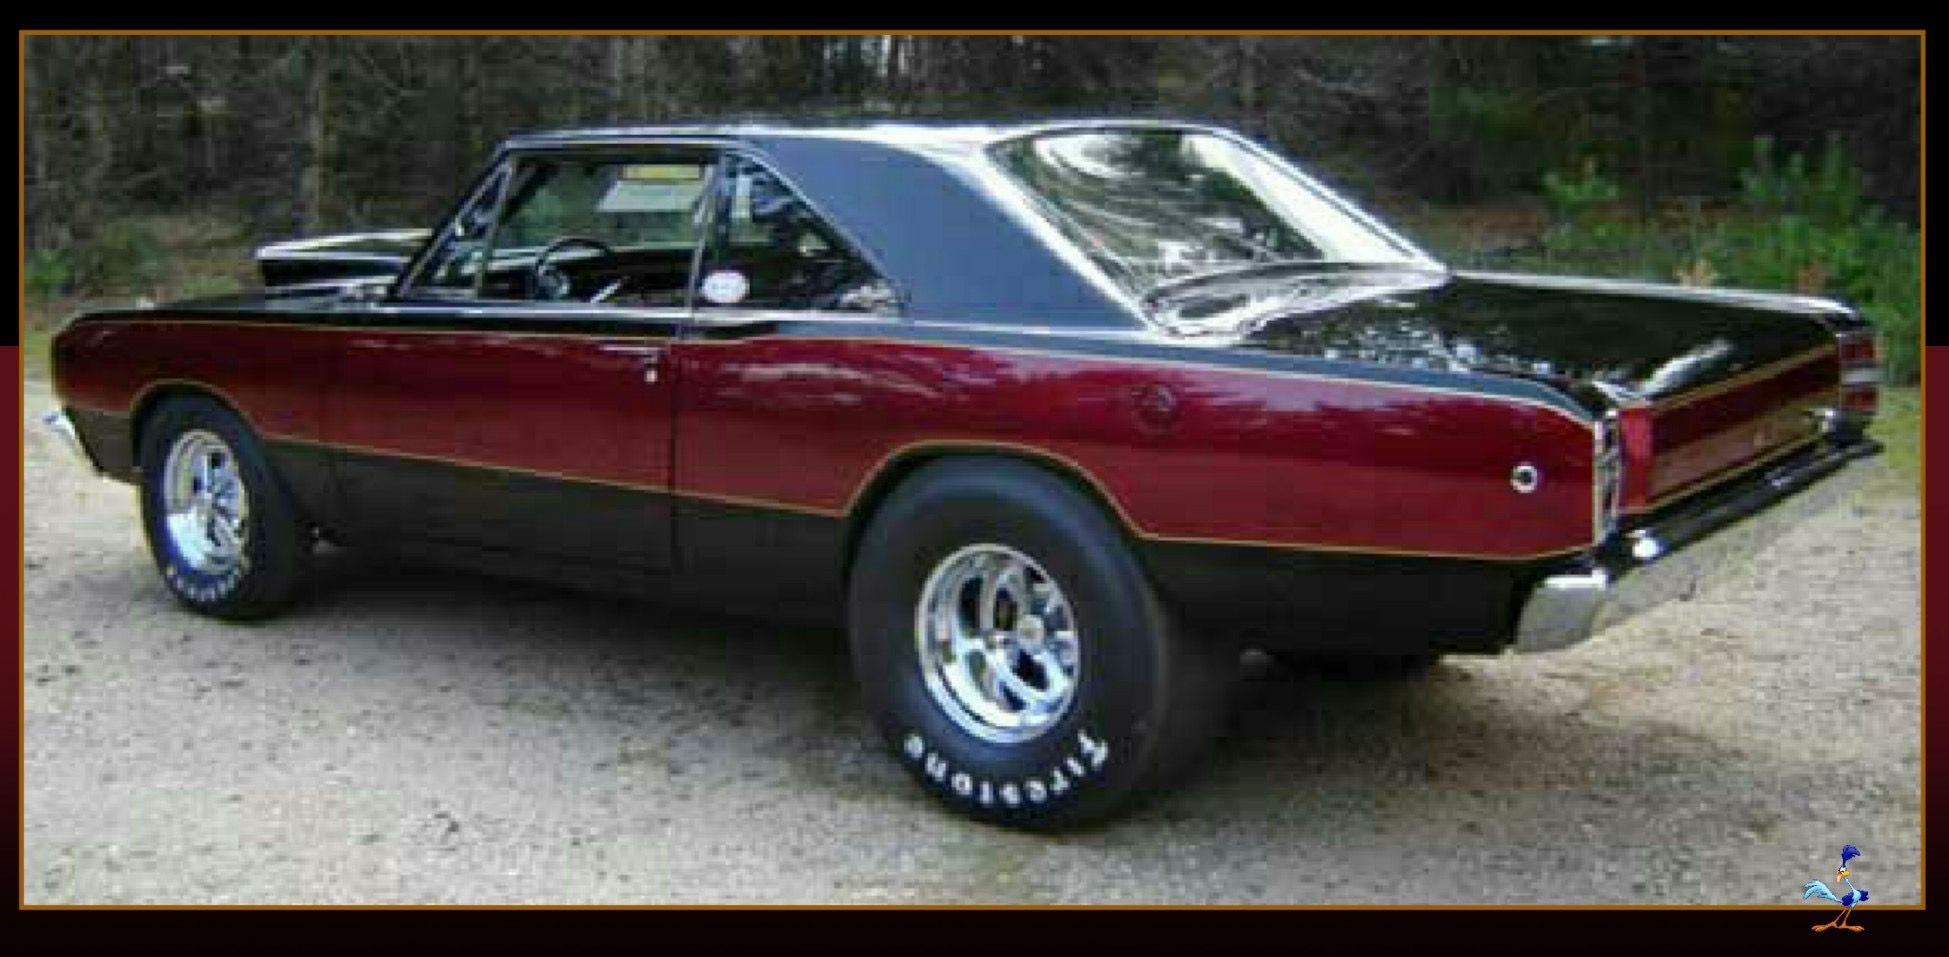 68 Dodge Factory Hurst 426 Hemi Super Stock Dart Mopar Muscle